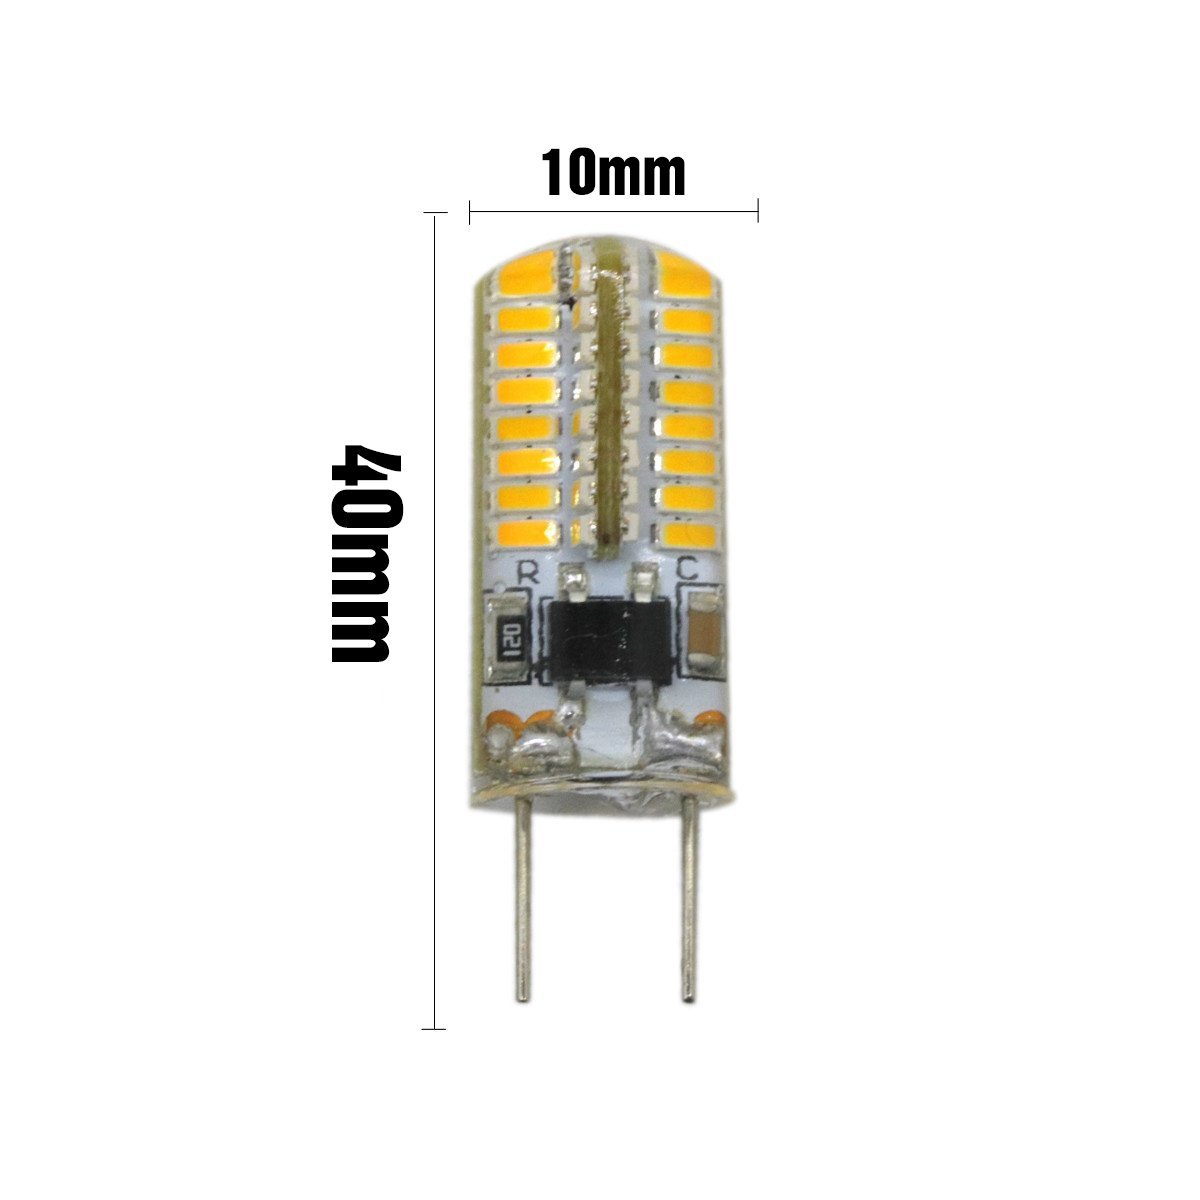 BMY Startseite Led Lampen 5 STÜCKE G8 64 LED 3014SMD 3 Watt 200 300 Lm  Warmweiß Dimmbare ...